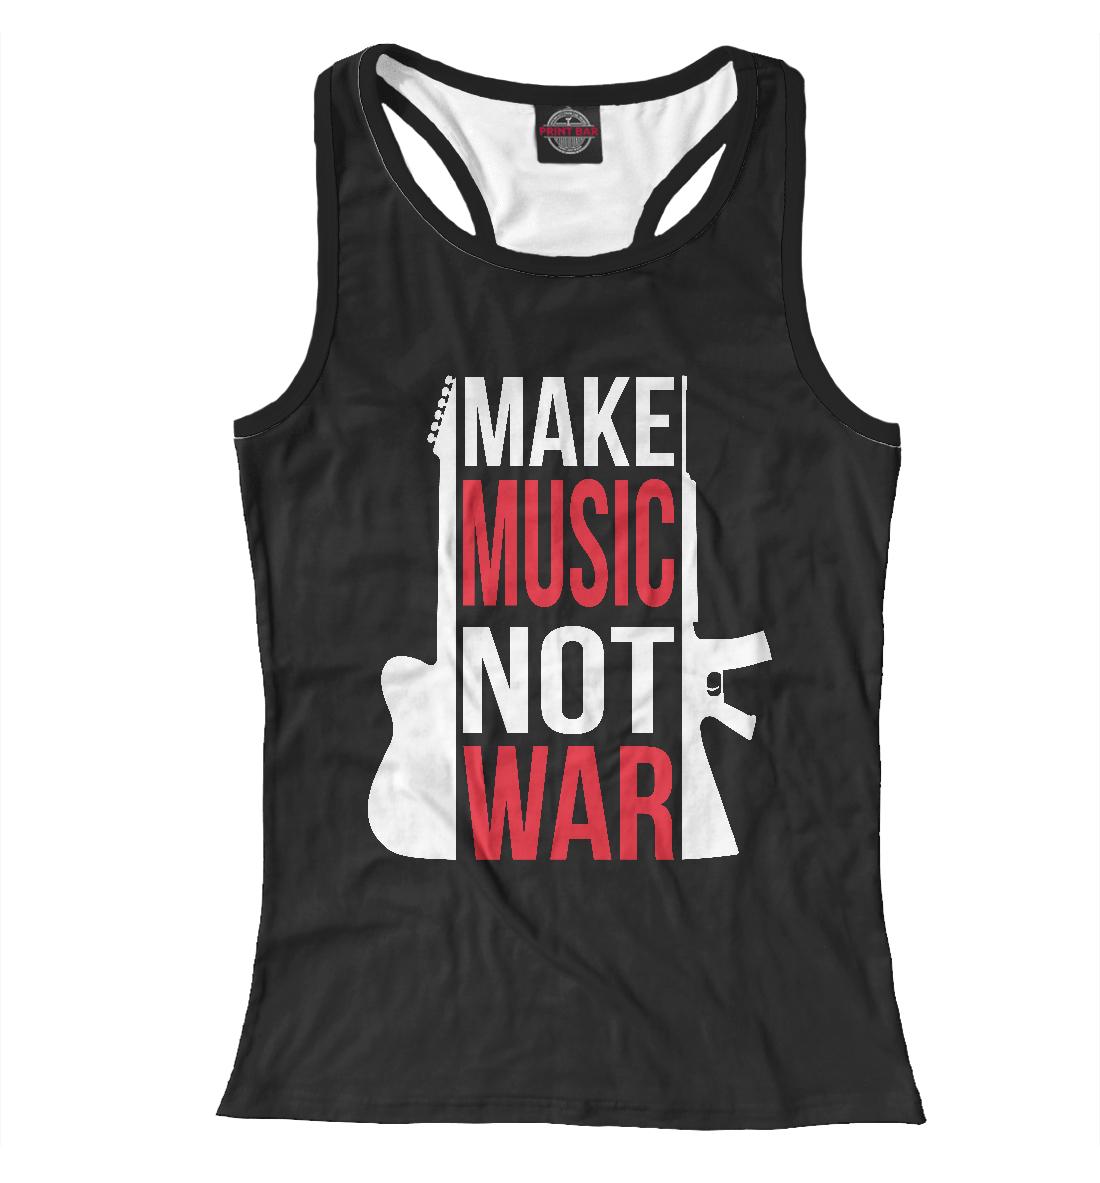 Купить Make Music not war, Printbar, Майки борцовки, RCK-622635-mayb-1